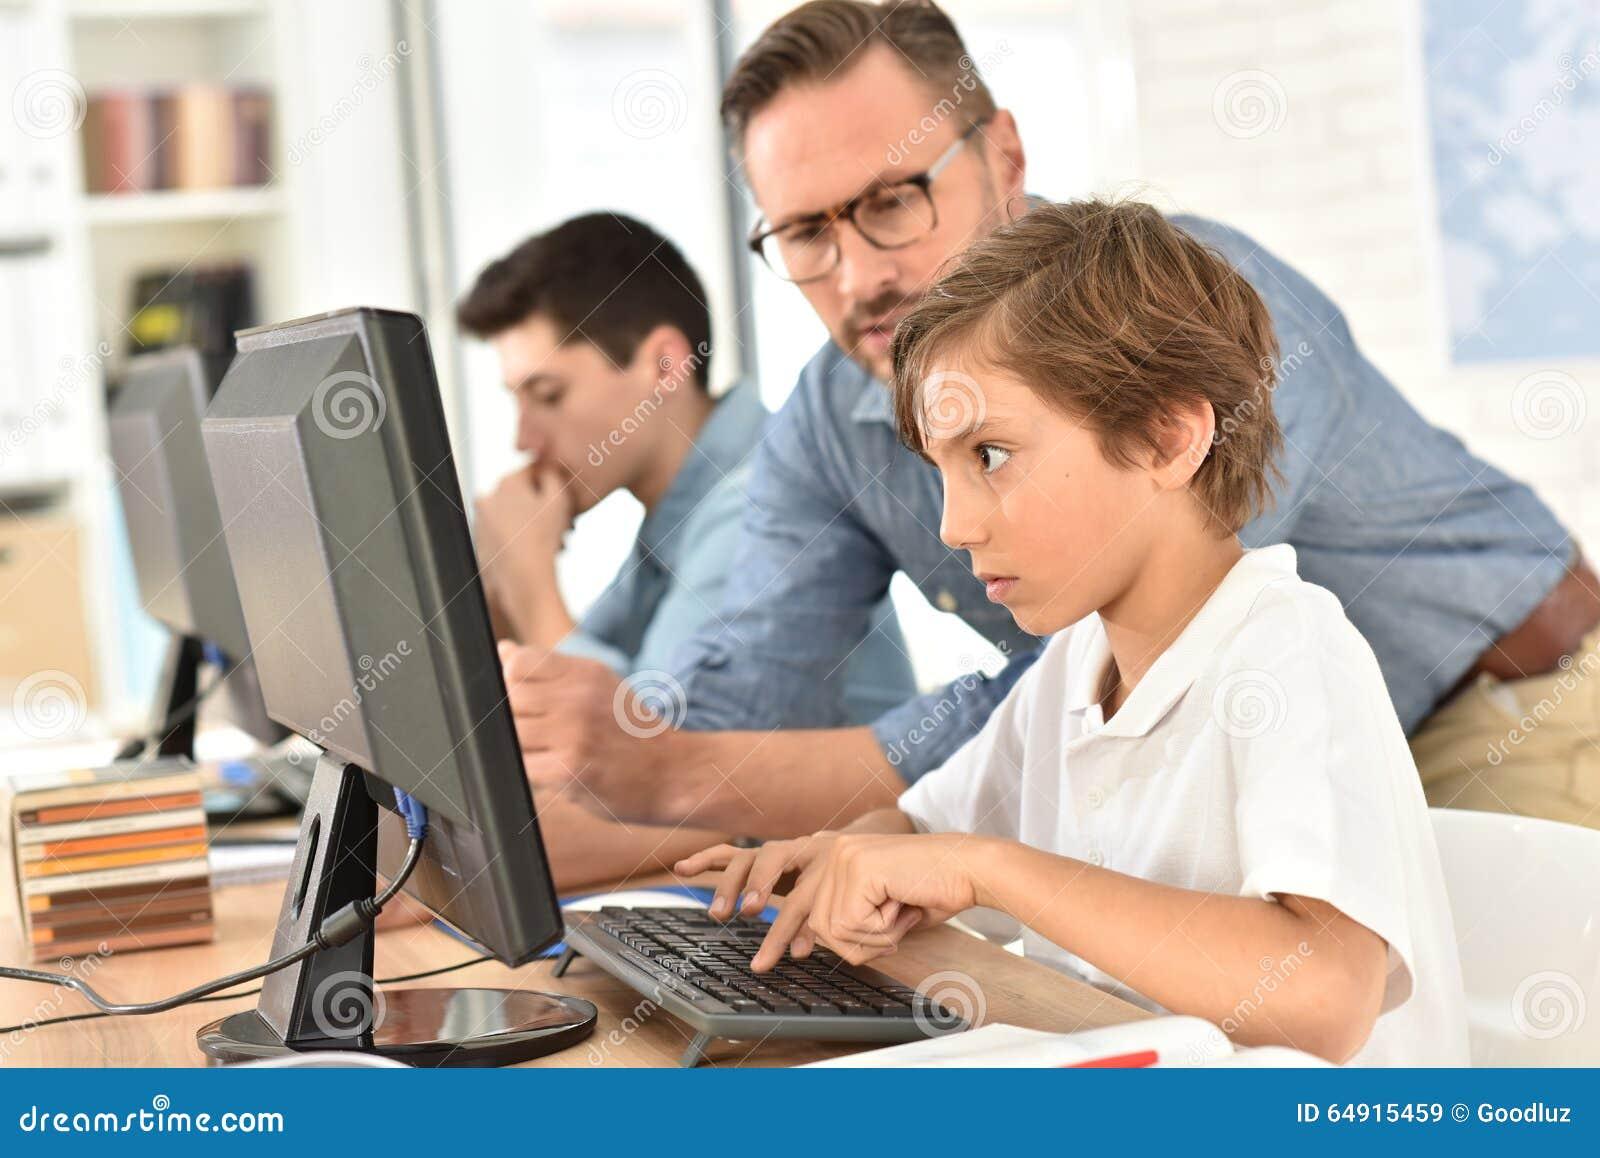 Teacher With Children Using Computer